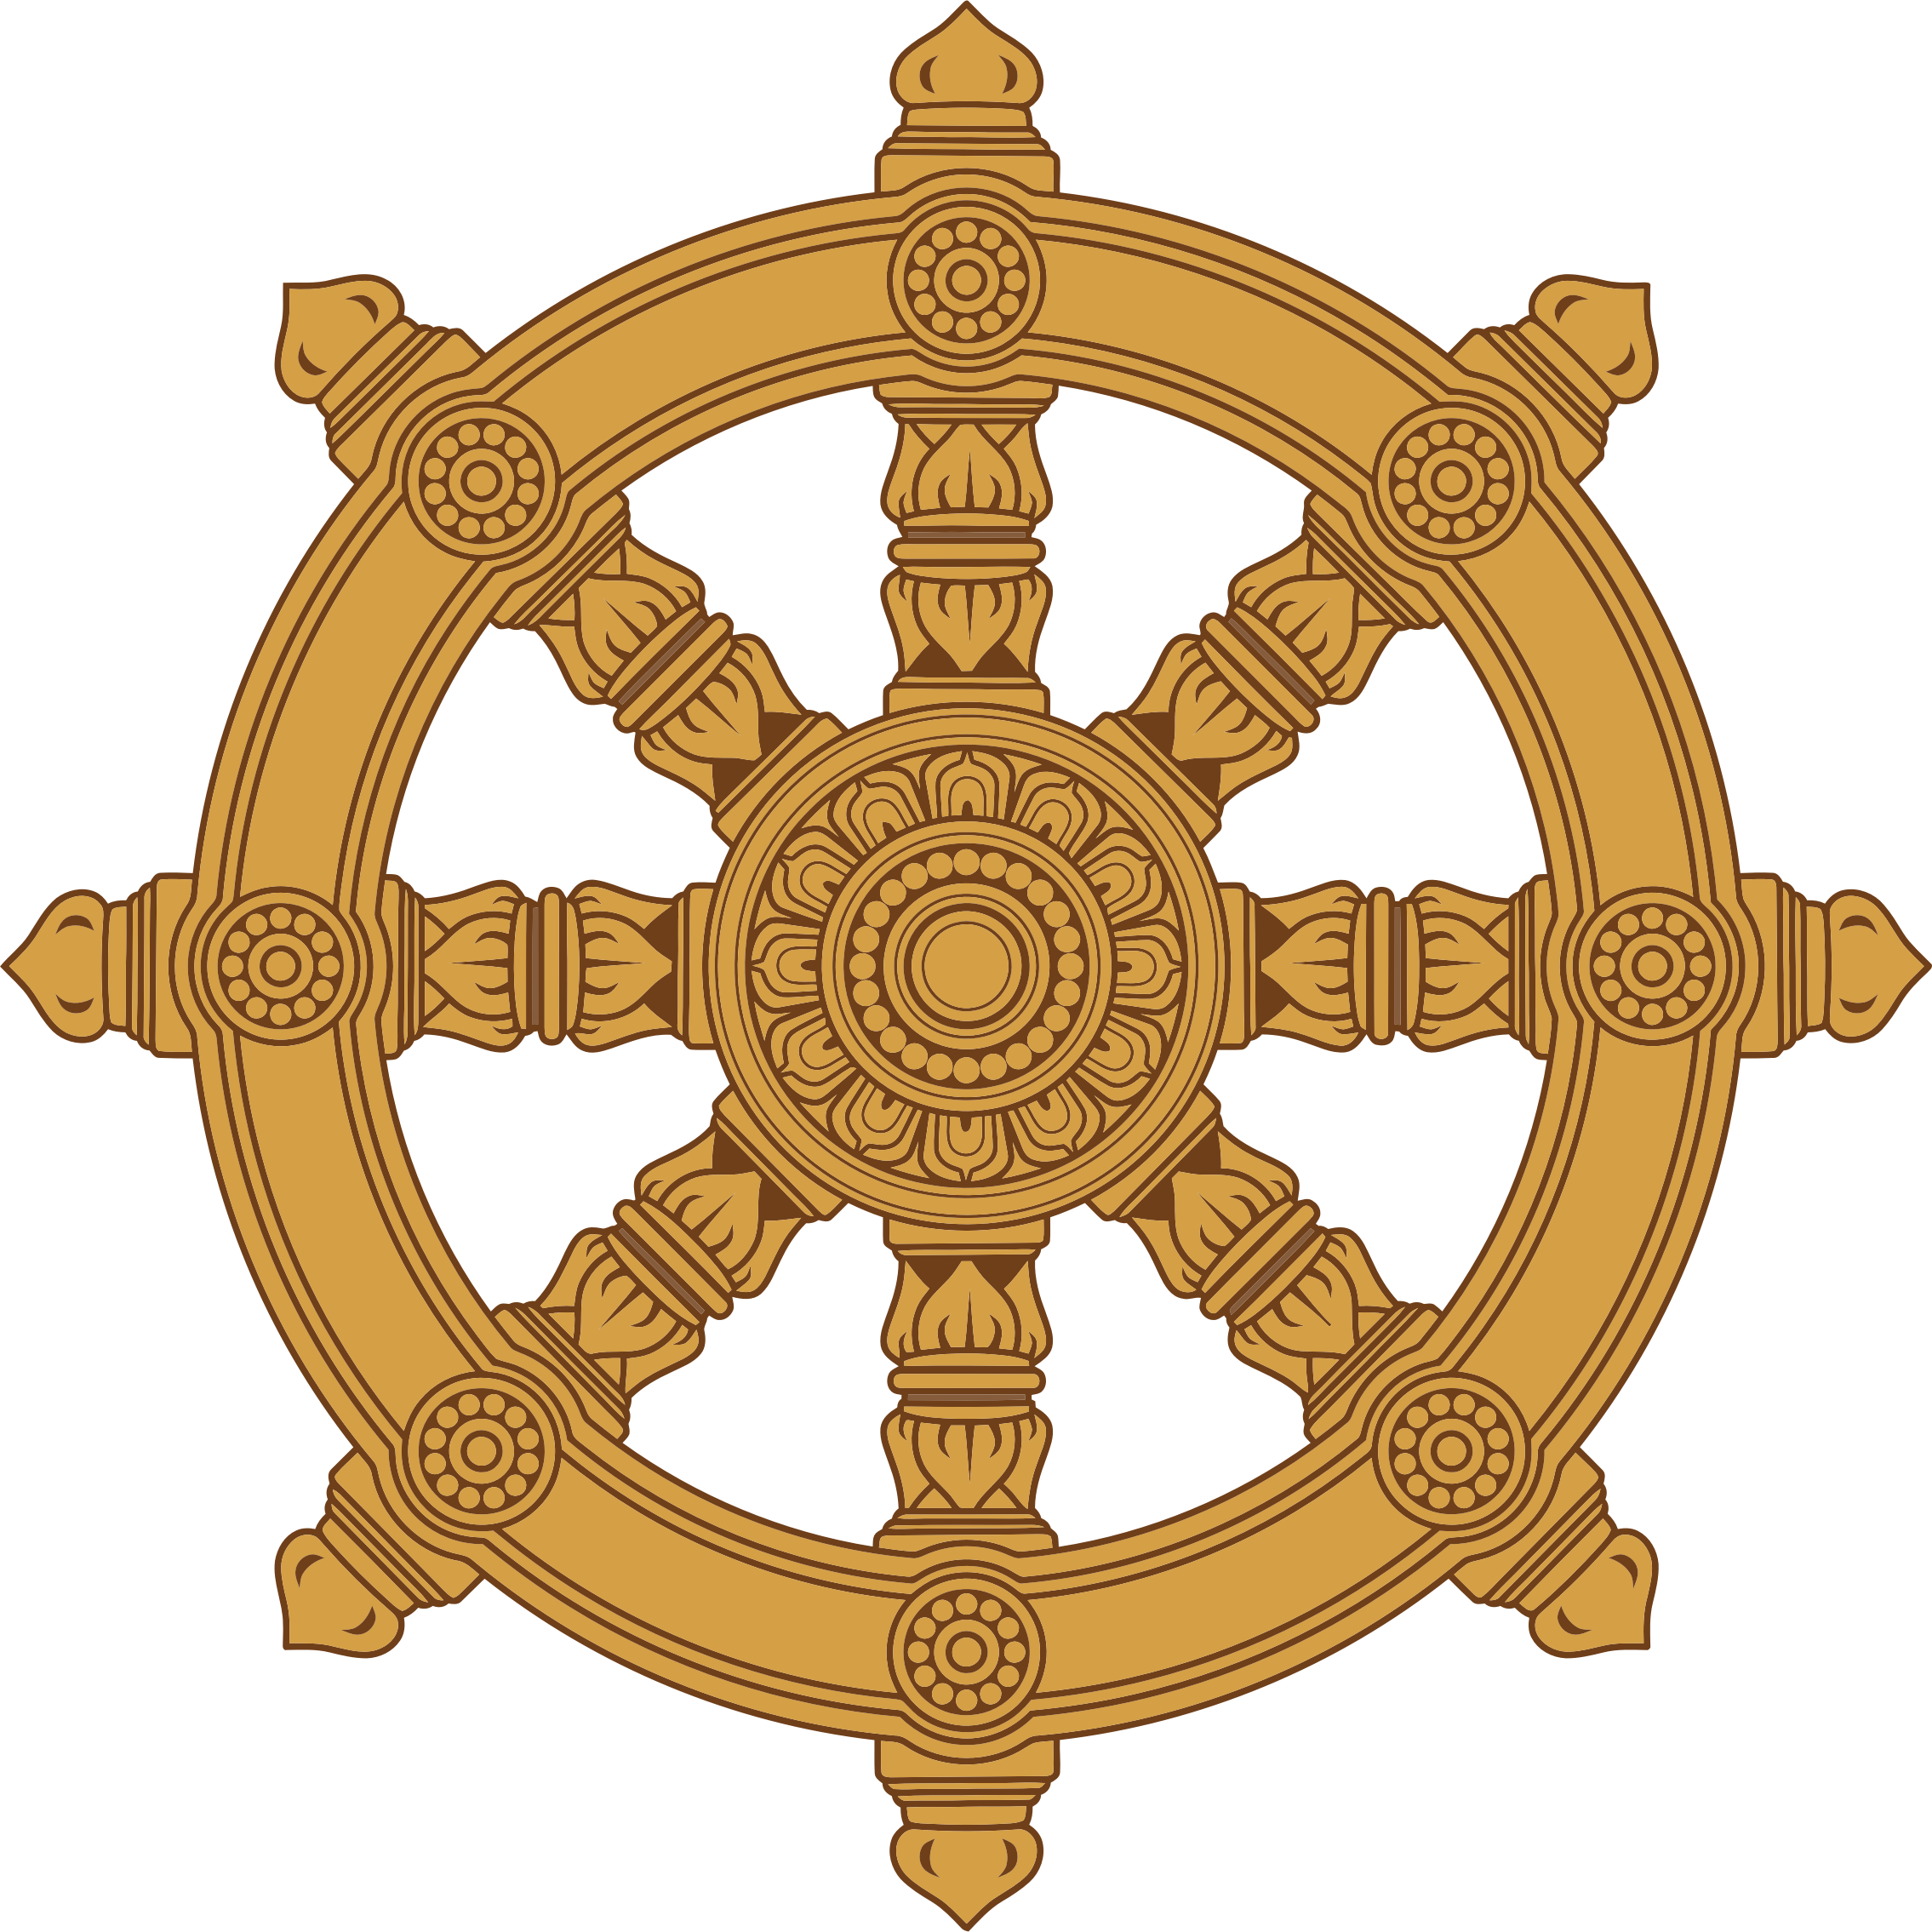 Dharma clipart Ornate Dharma Ornate Wheel Wheel